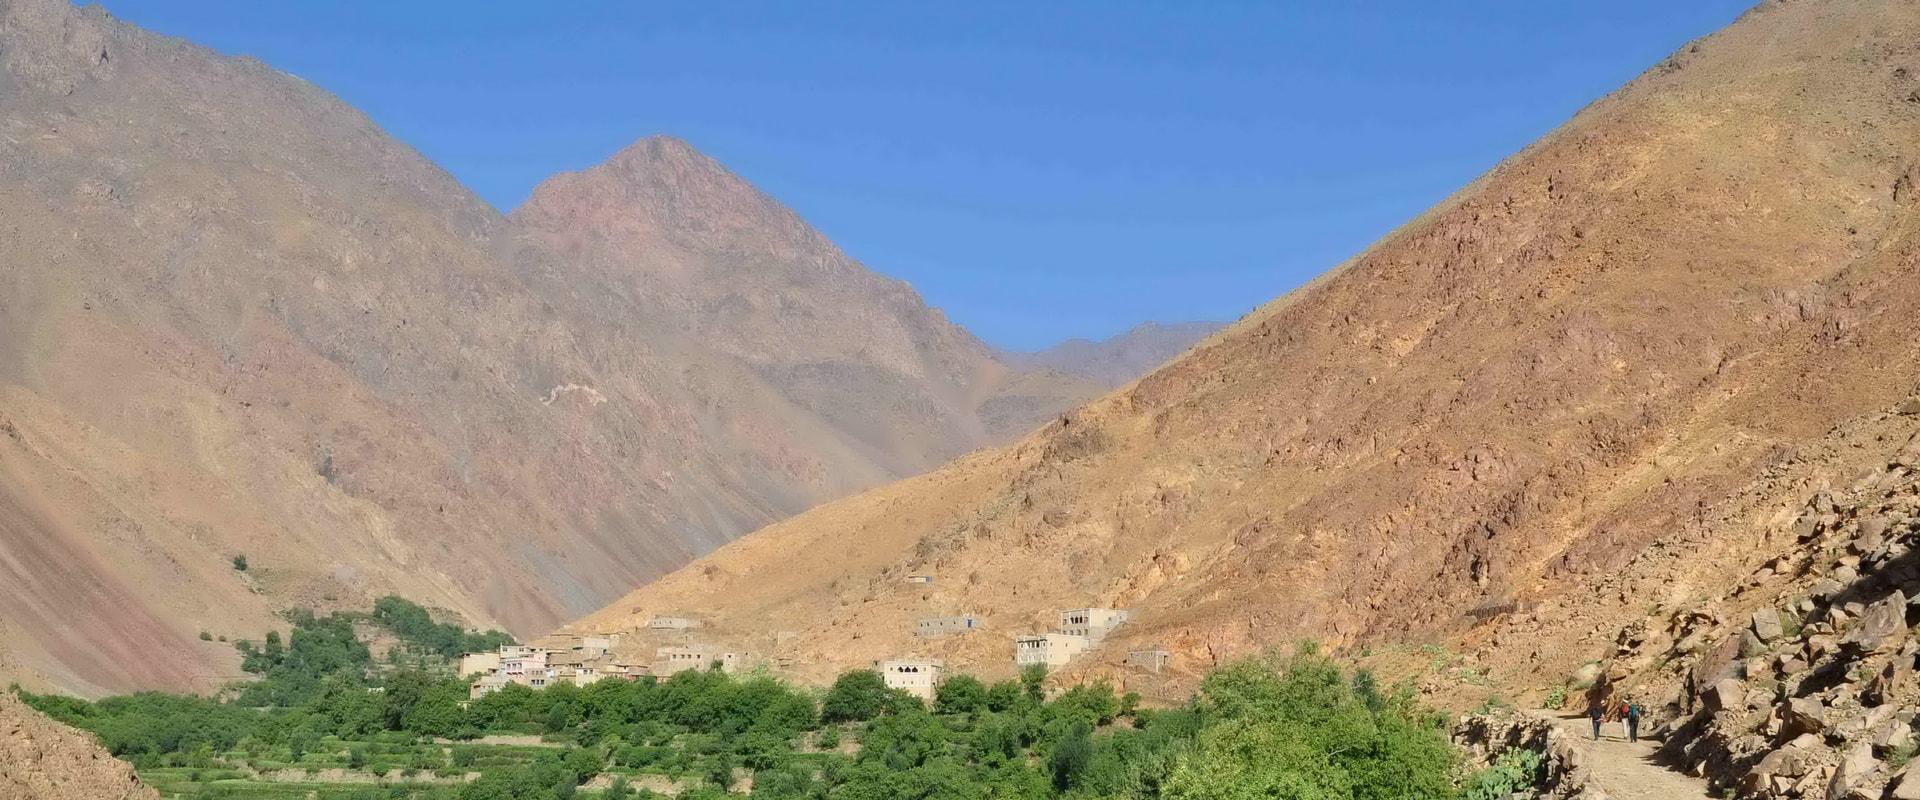 Voyages Expeditions Maroc - villages berberes - vallee d'azzaden